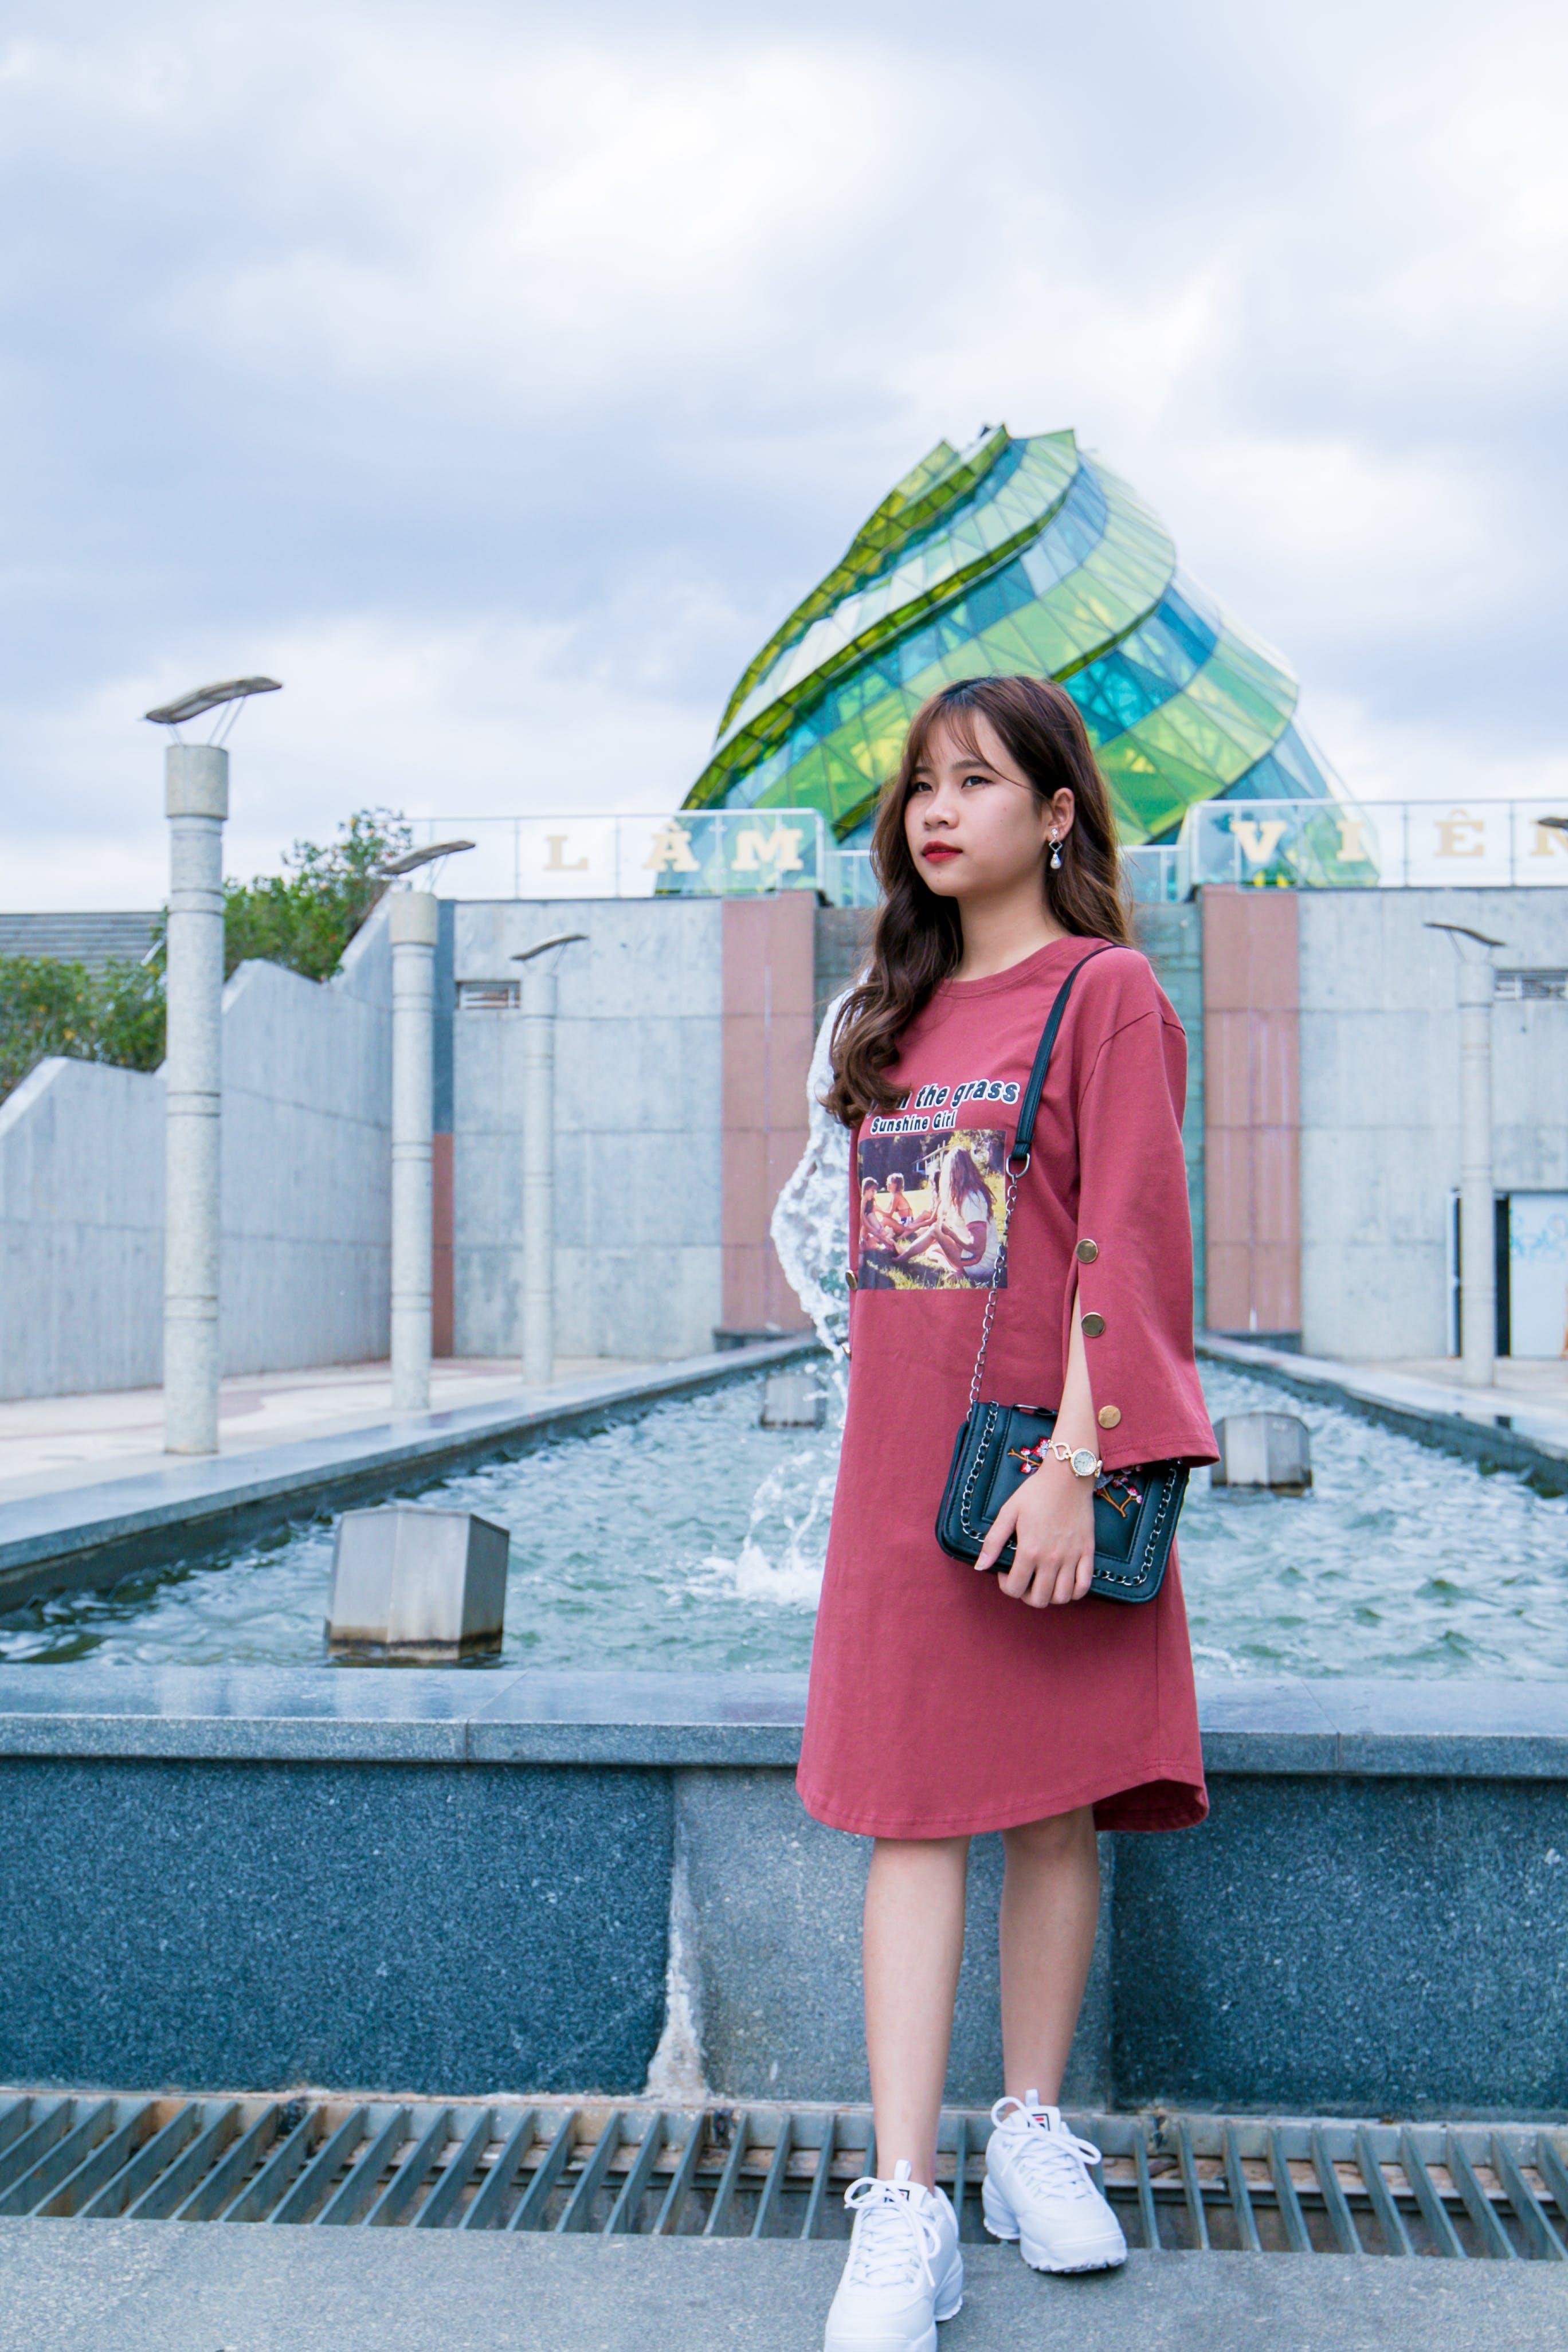 Woman Wearing Red Dress Standing Near Fountain